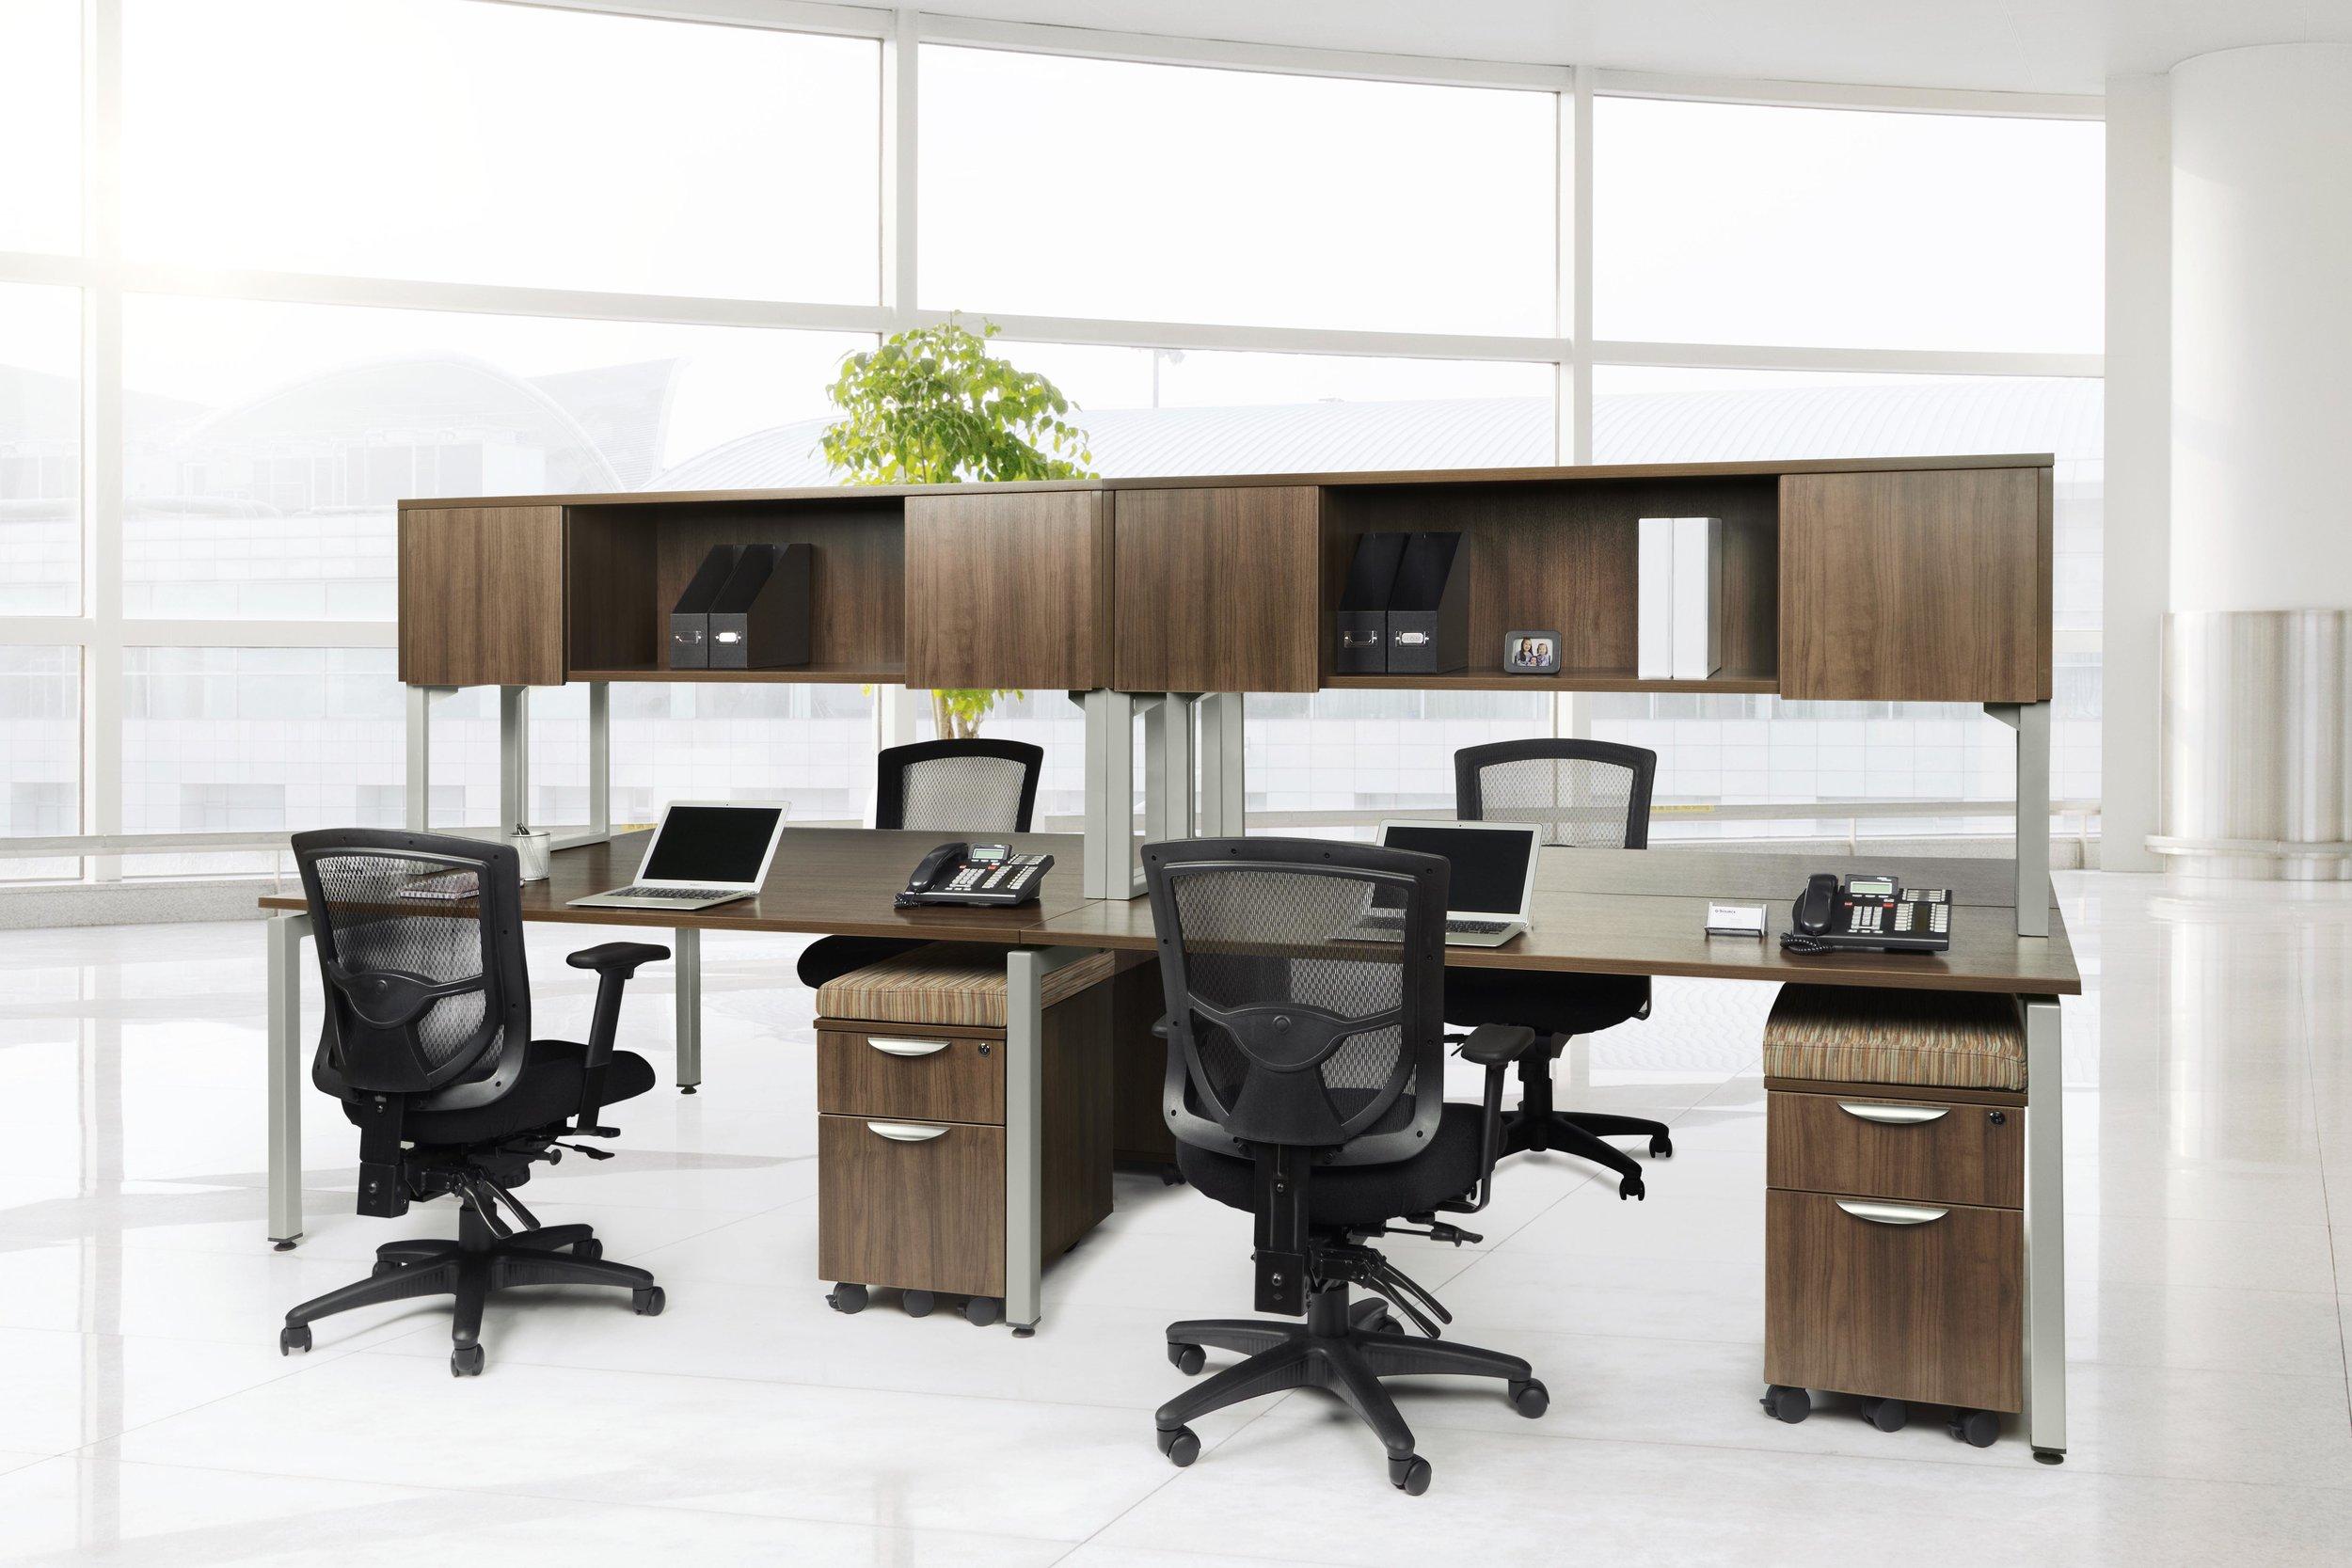 4+ Person Workstation_Bottom Photo.jpg